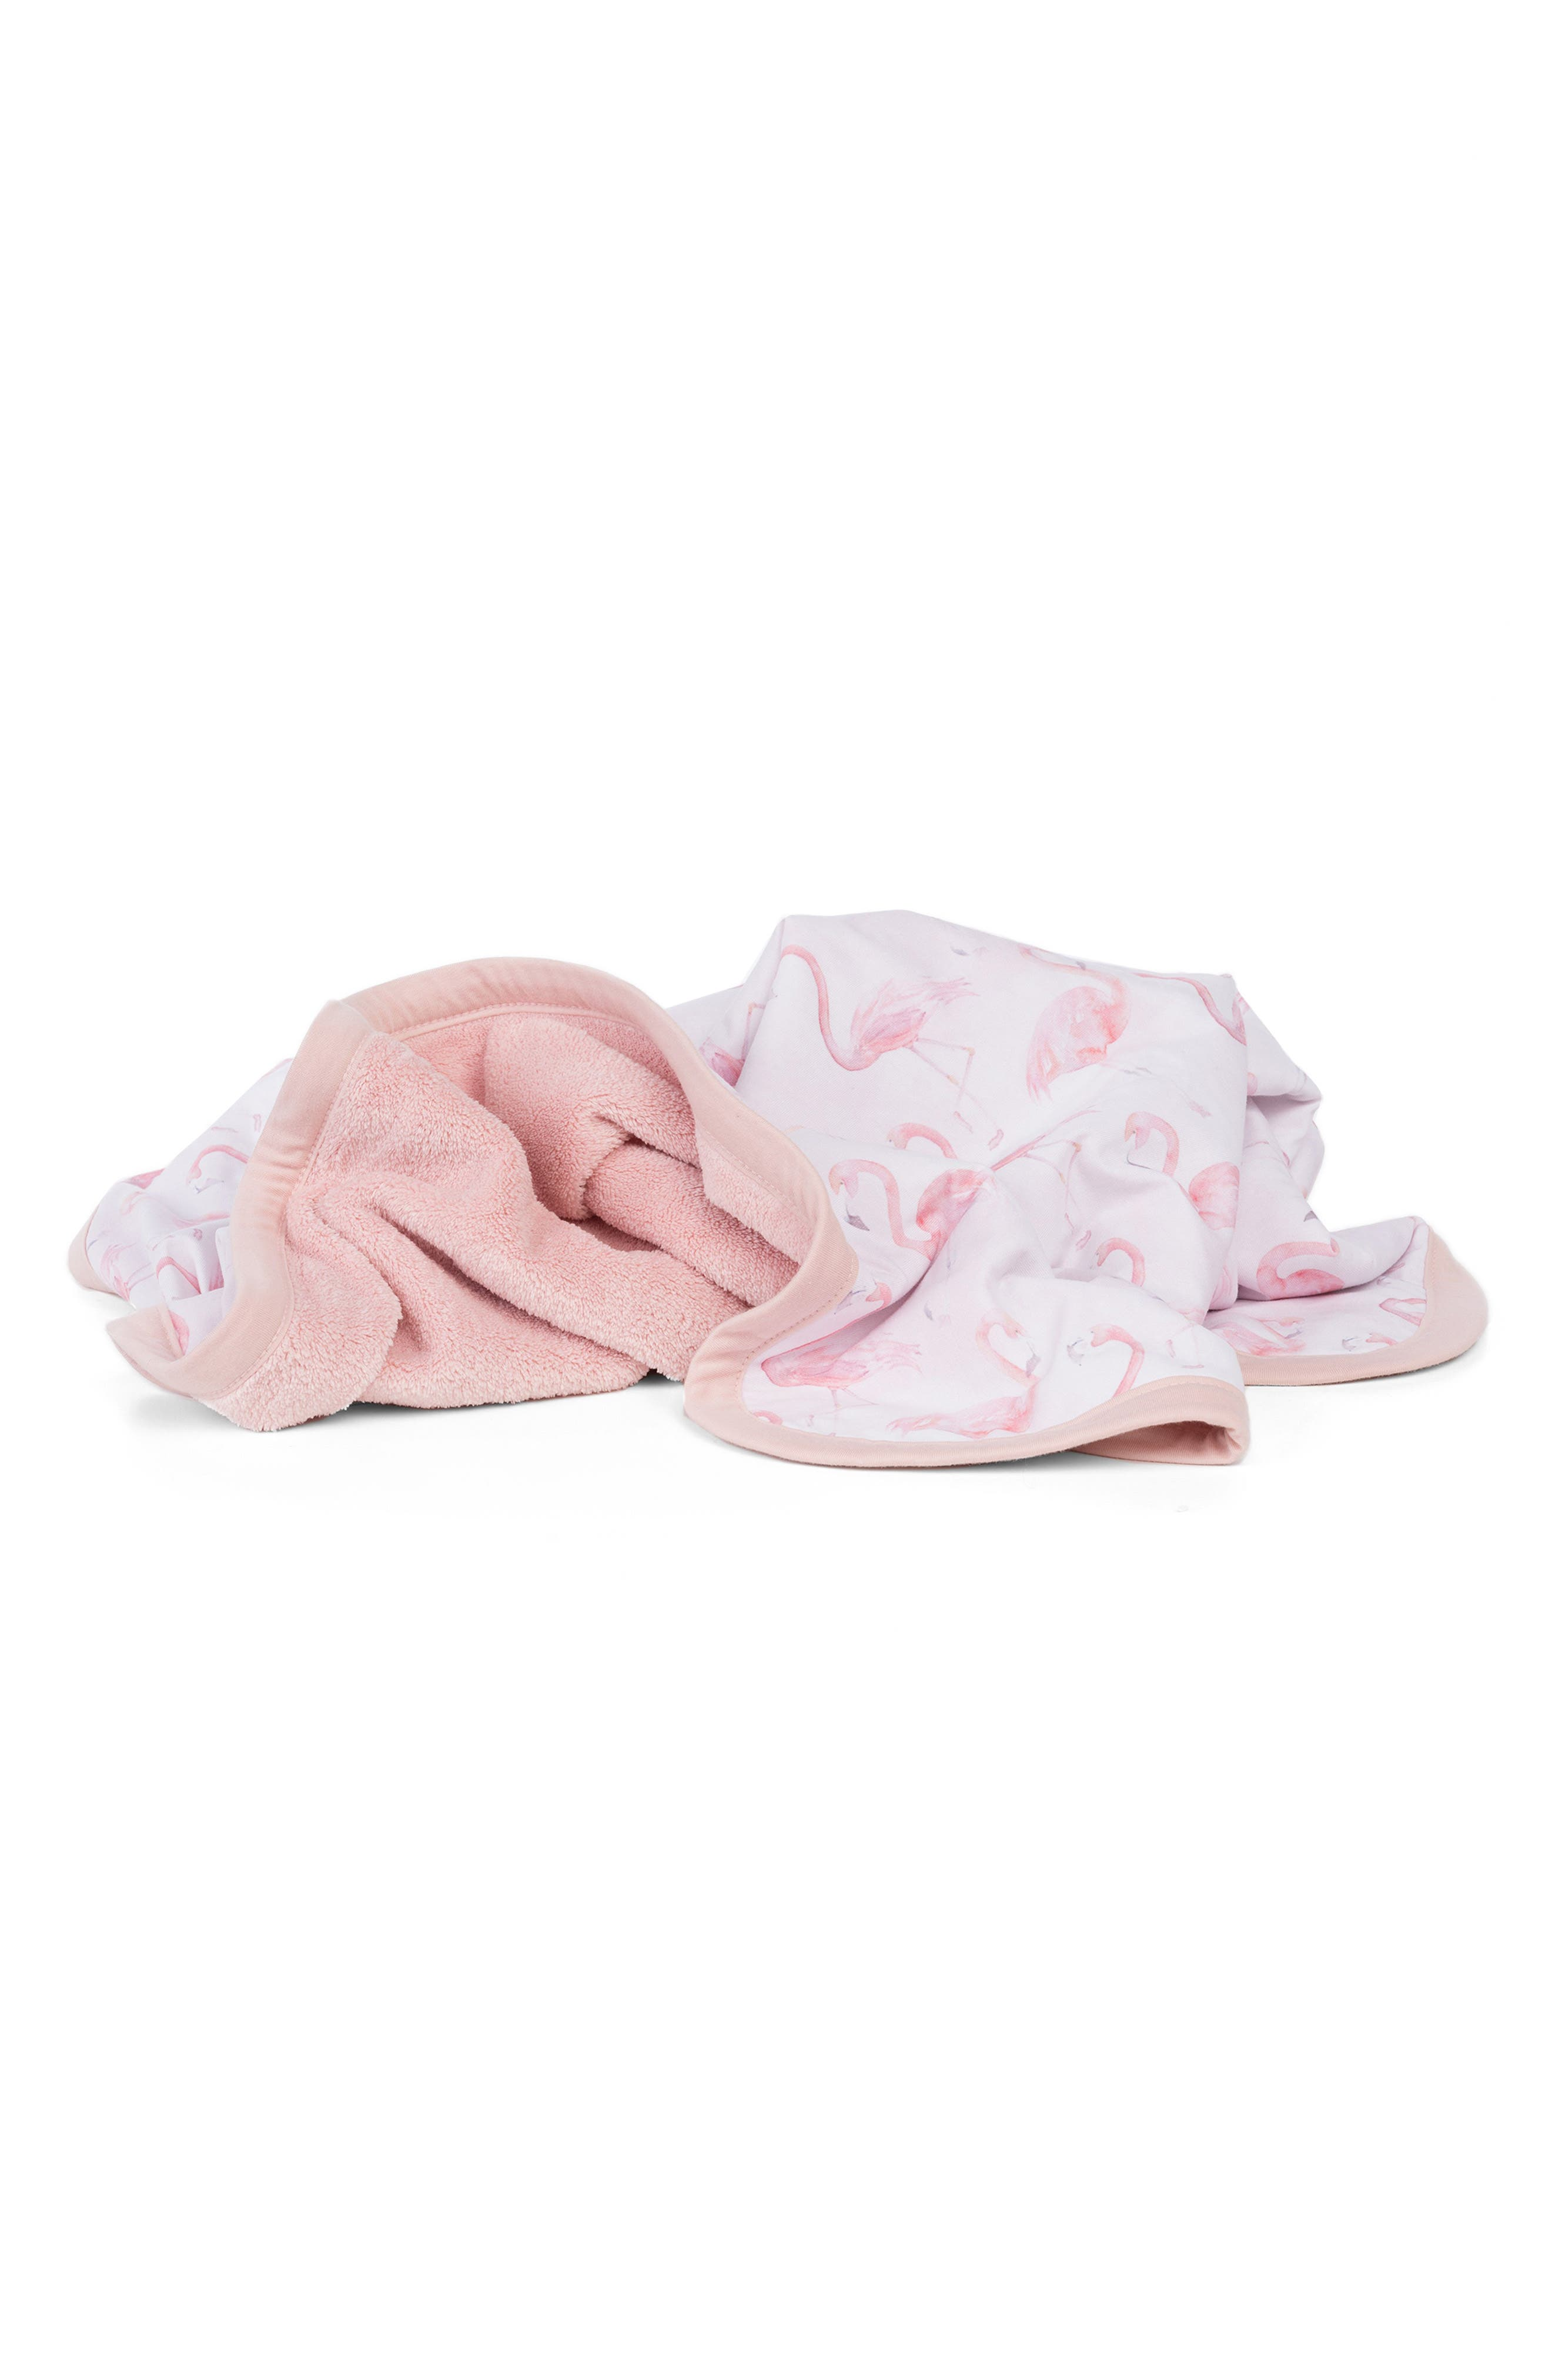 OILO Flamingo Cuddle Blanket, Main, color, BLUSH